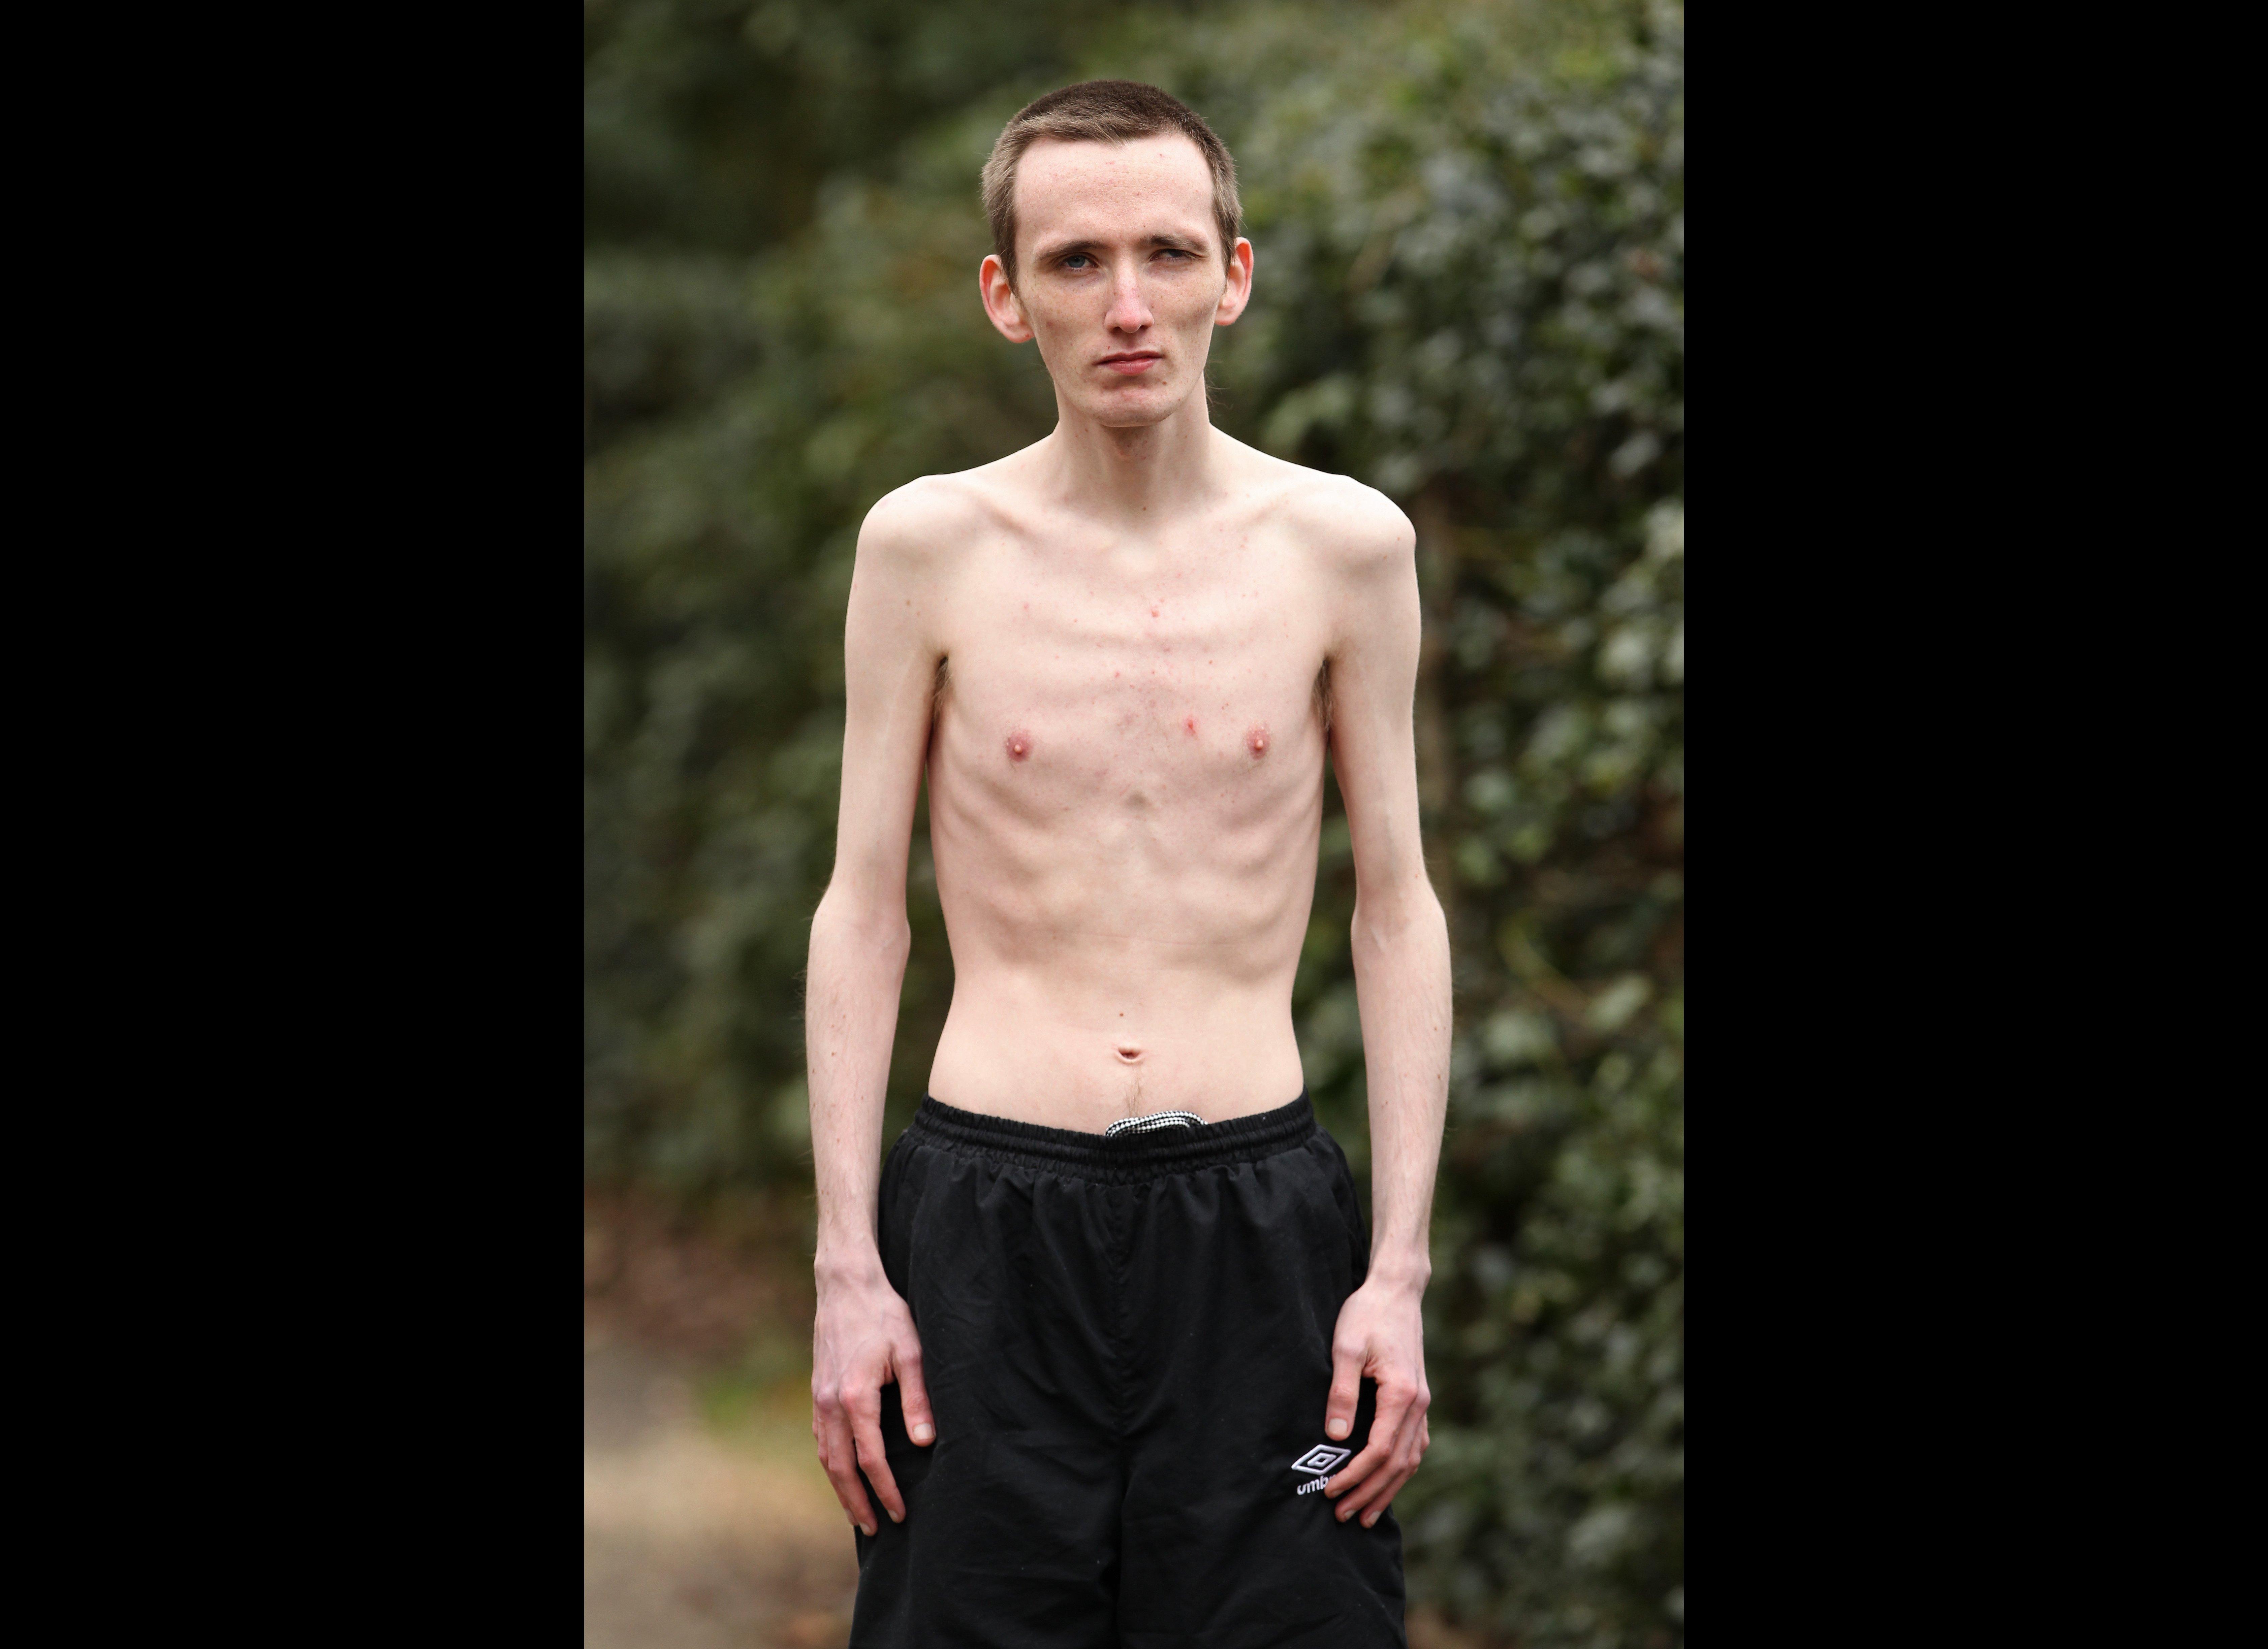 disney jasmine naked